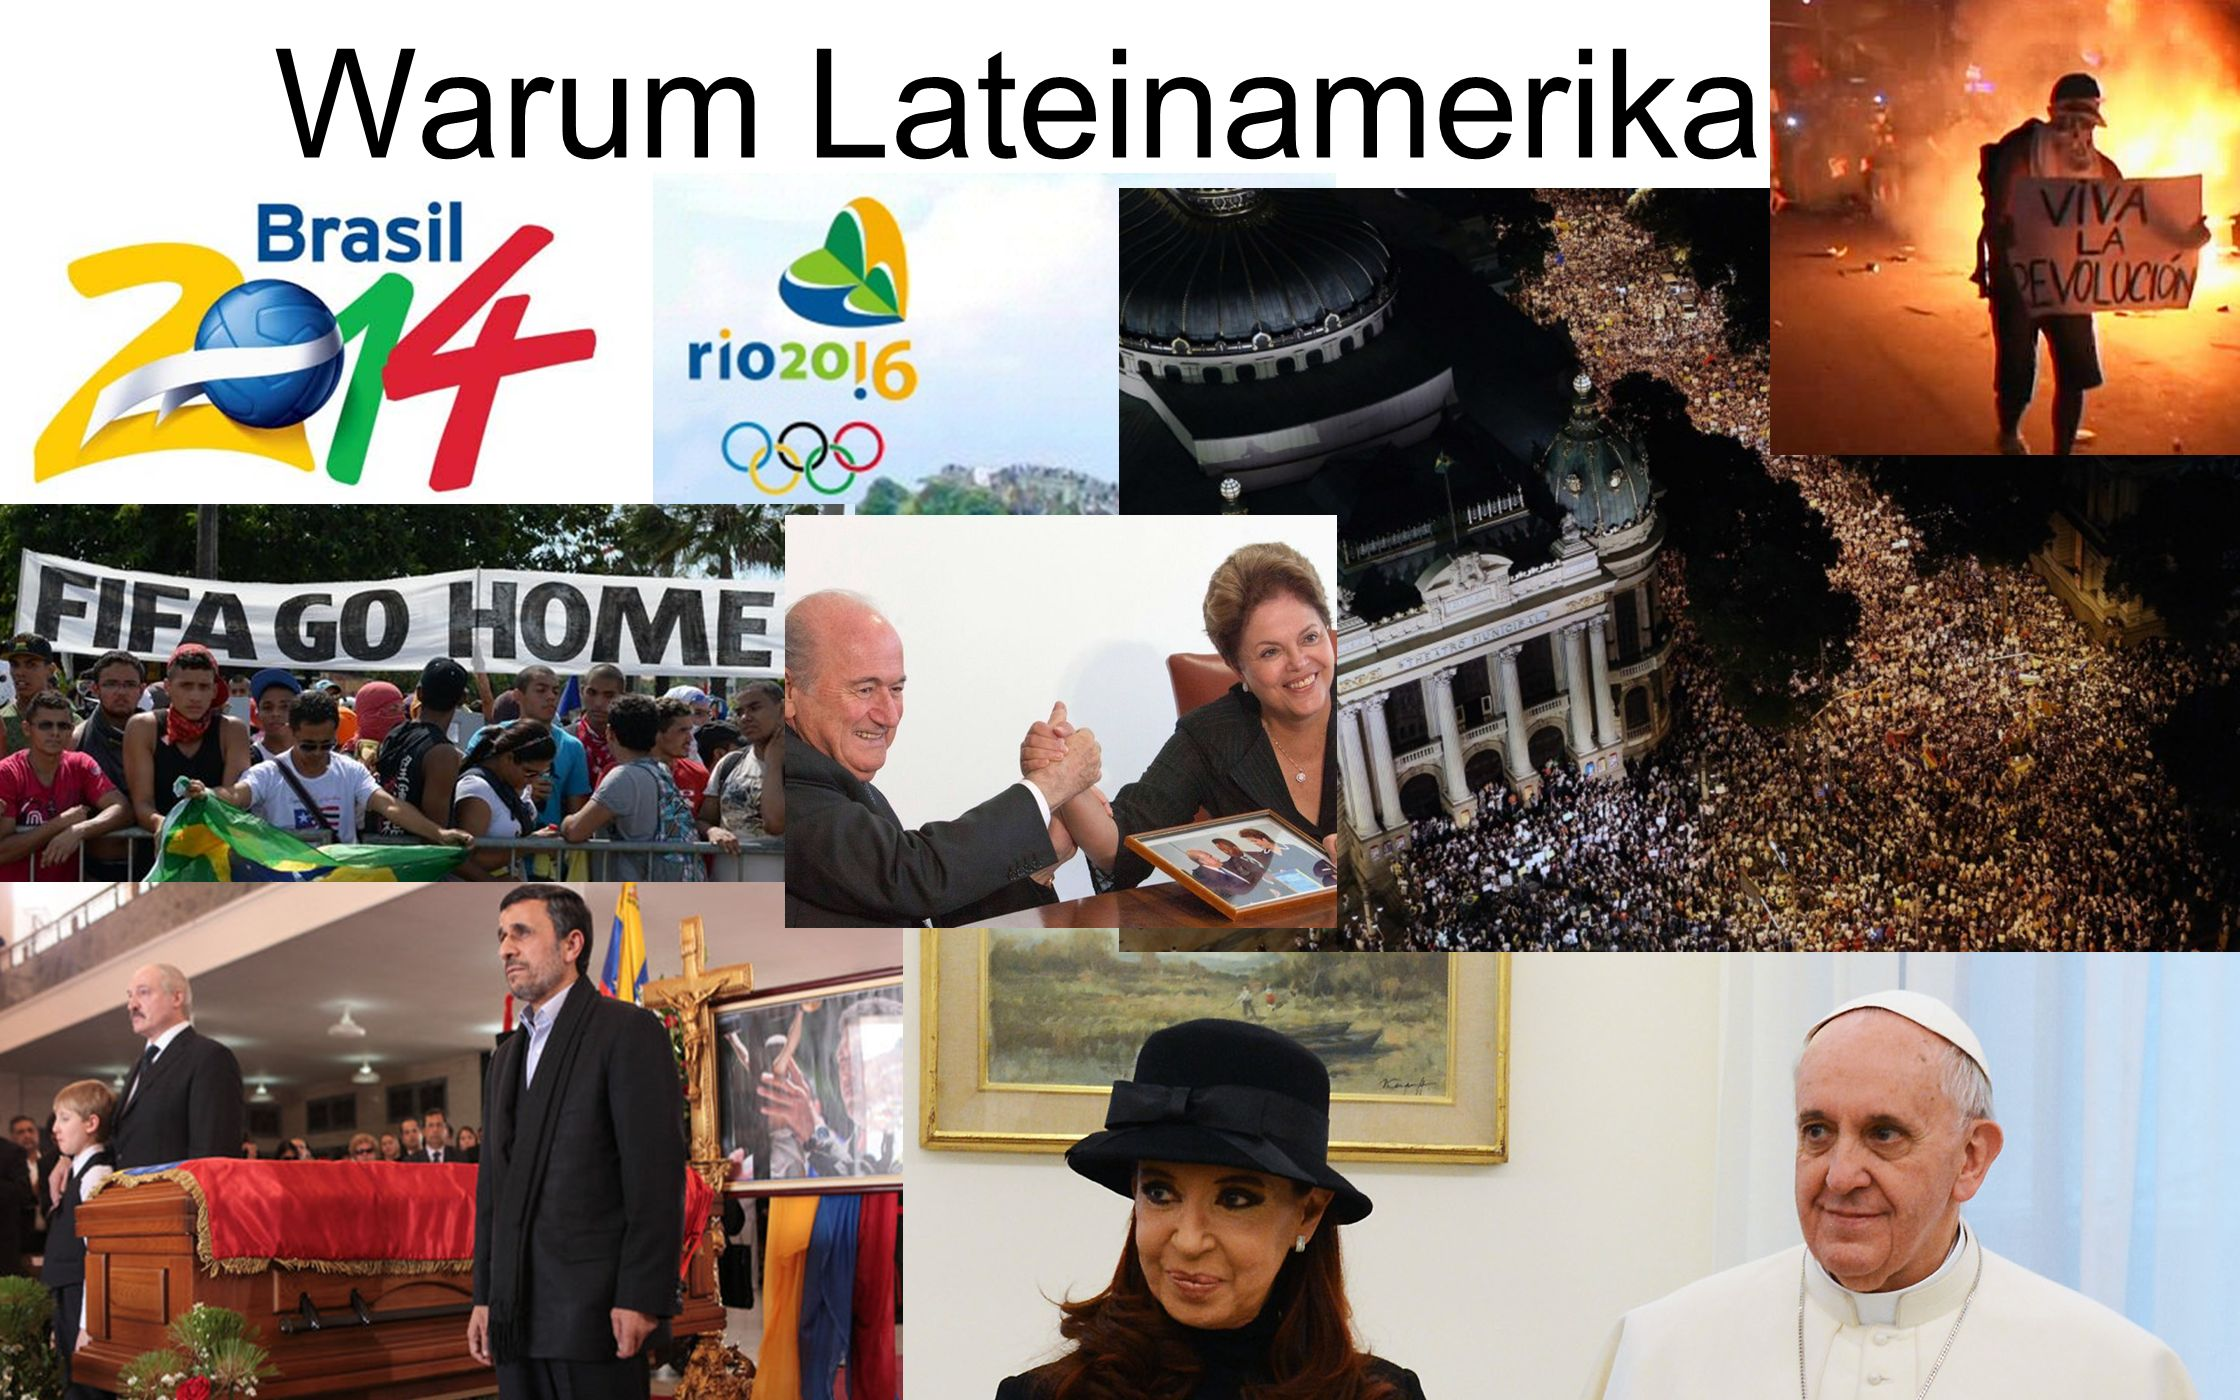 Warum Lateinamerika?